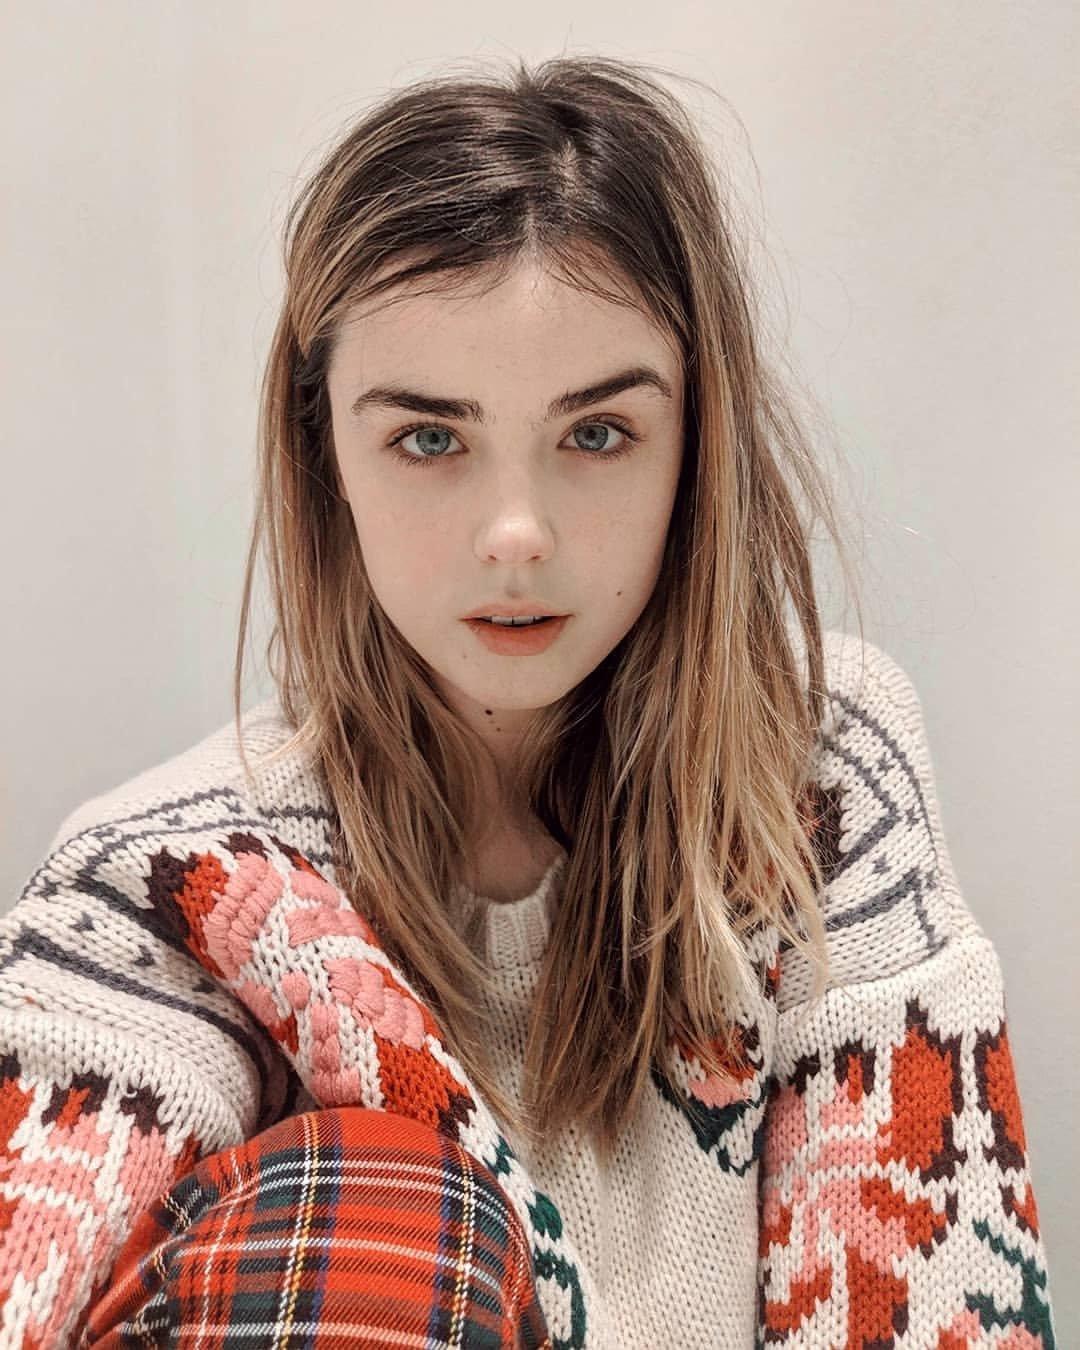 Danielle Sharp - Most Beautifulest Girls In This World